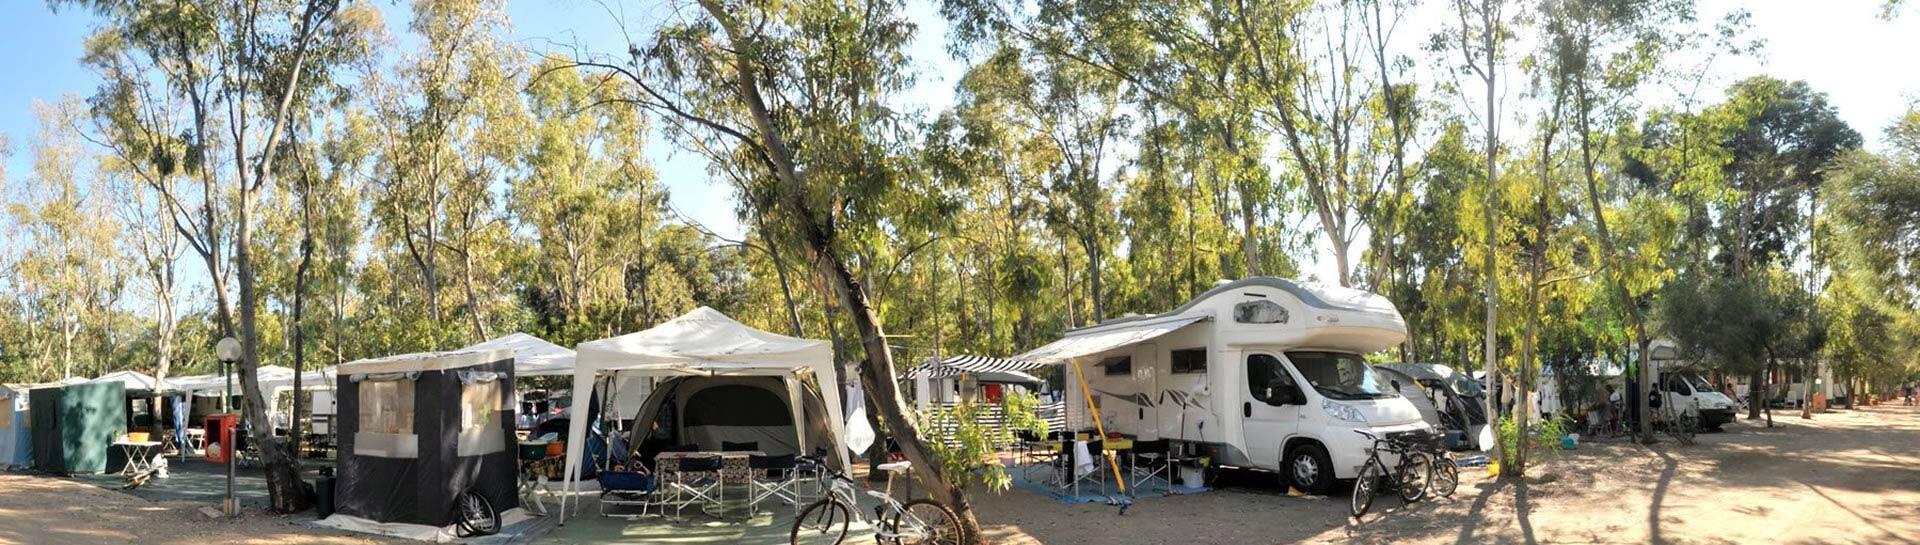 4mori de campingplatz-muravera 011